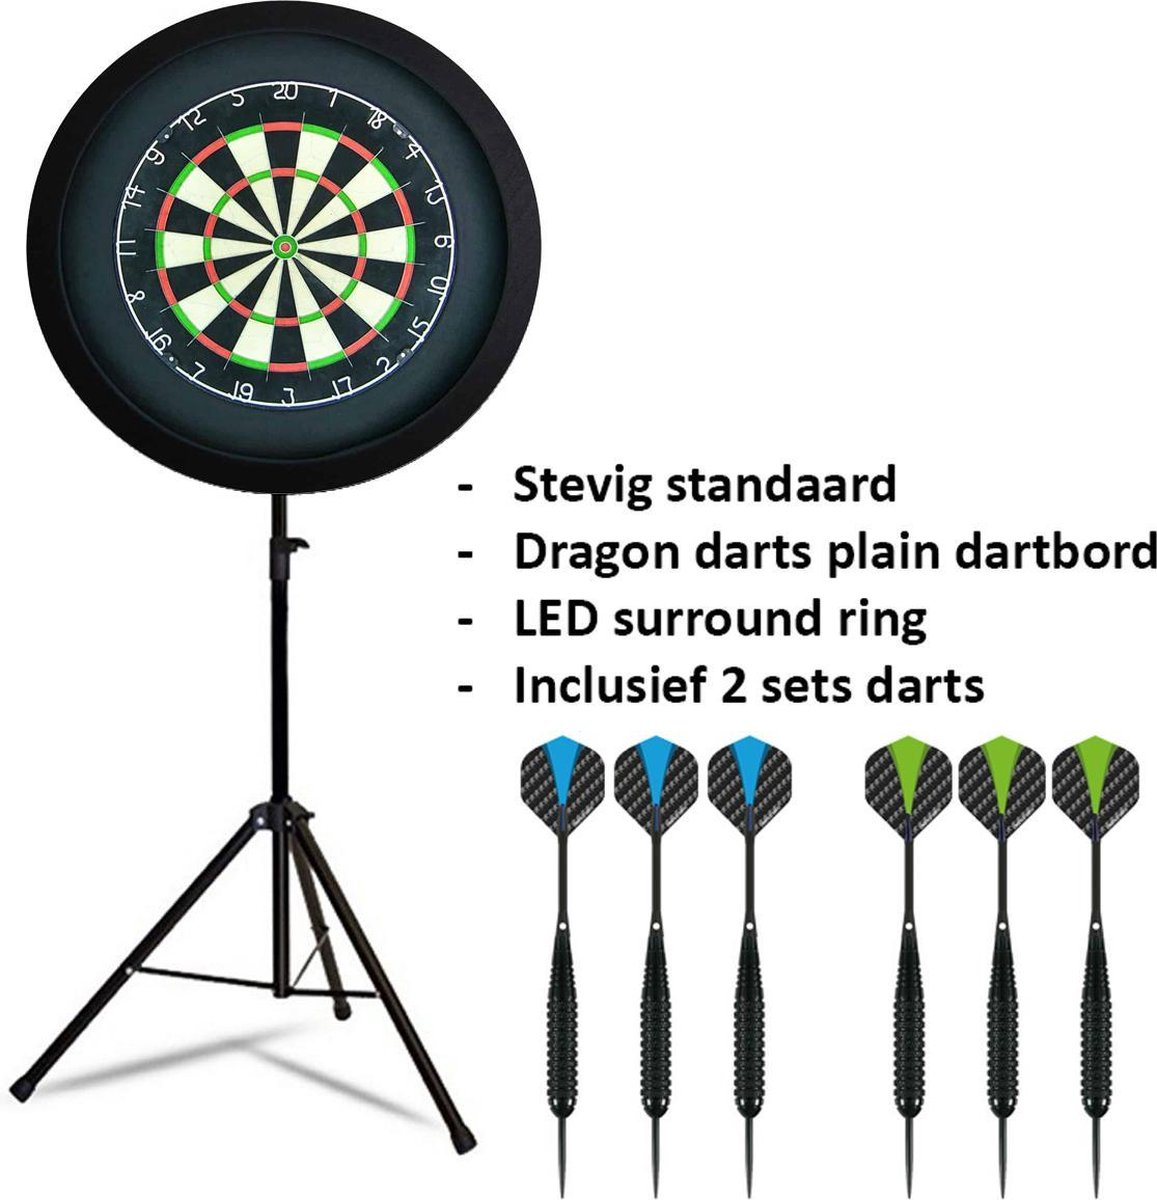 Dragon darts - Portable dartbord standaard LED pakket plus - inclusief best geteste - dartbord - LED surround ring - en - dartpijlen - zwart